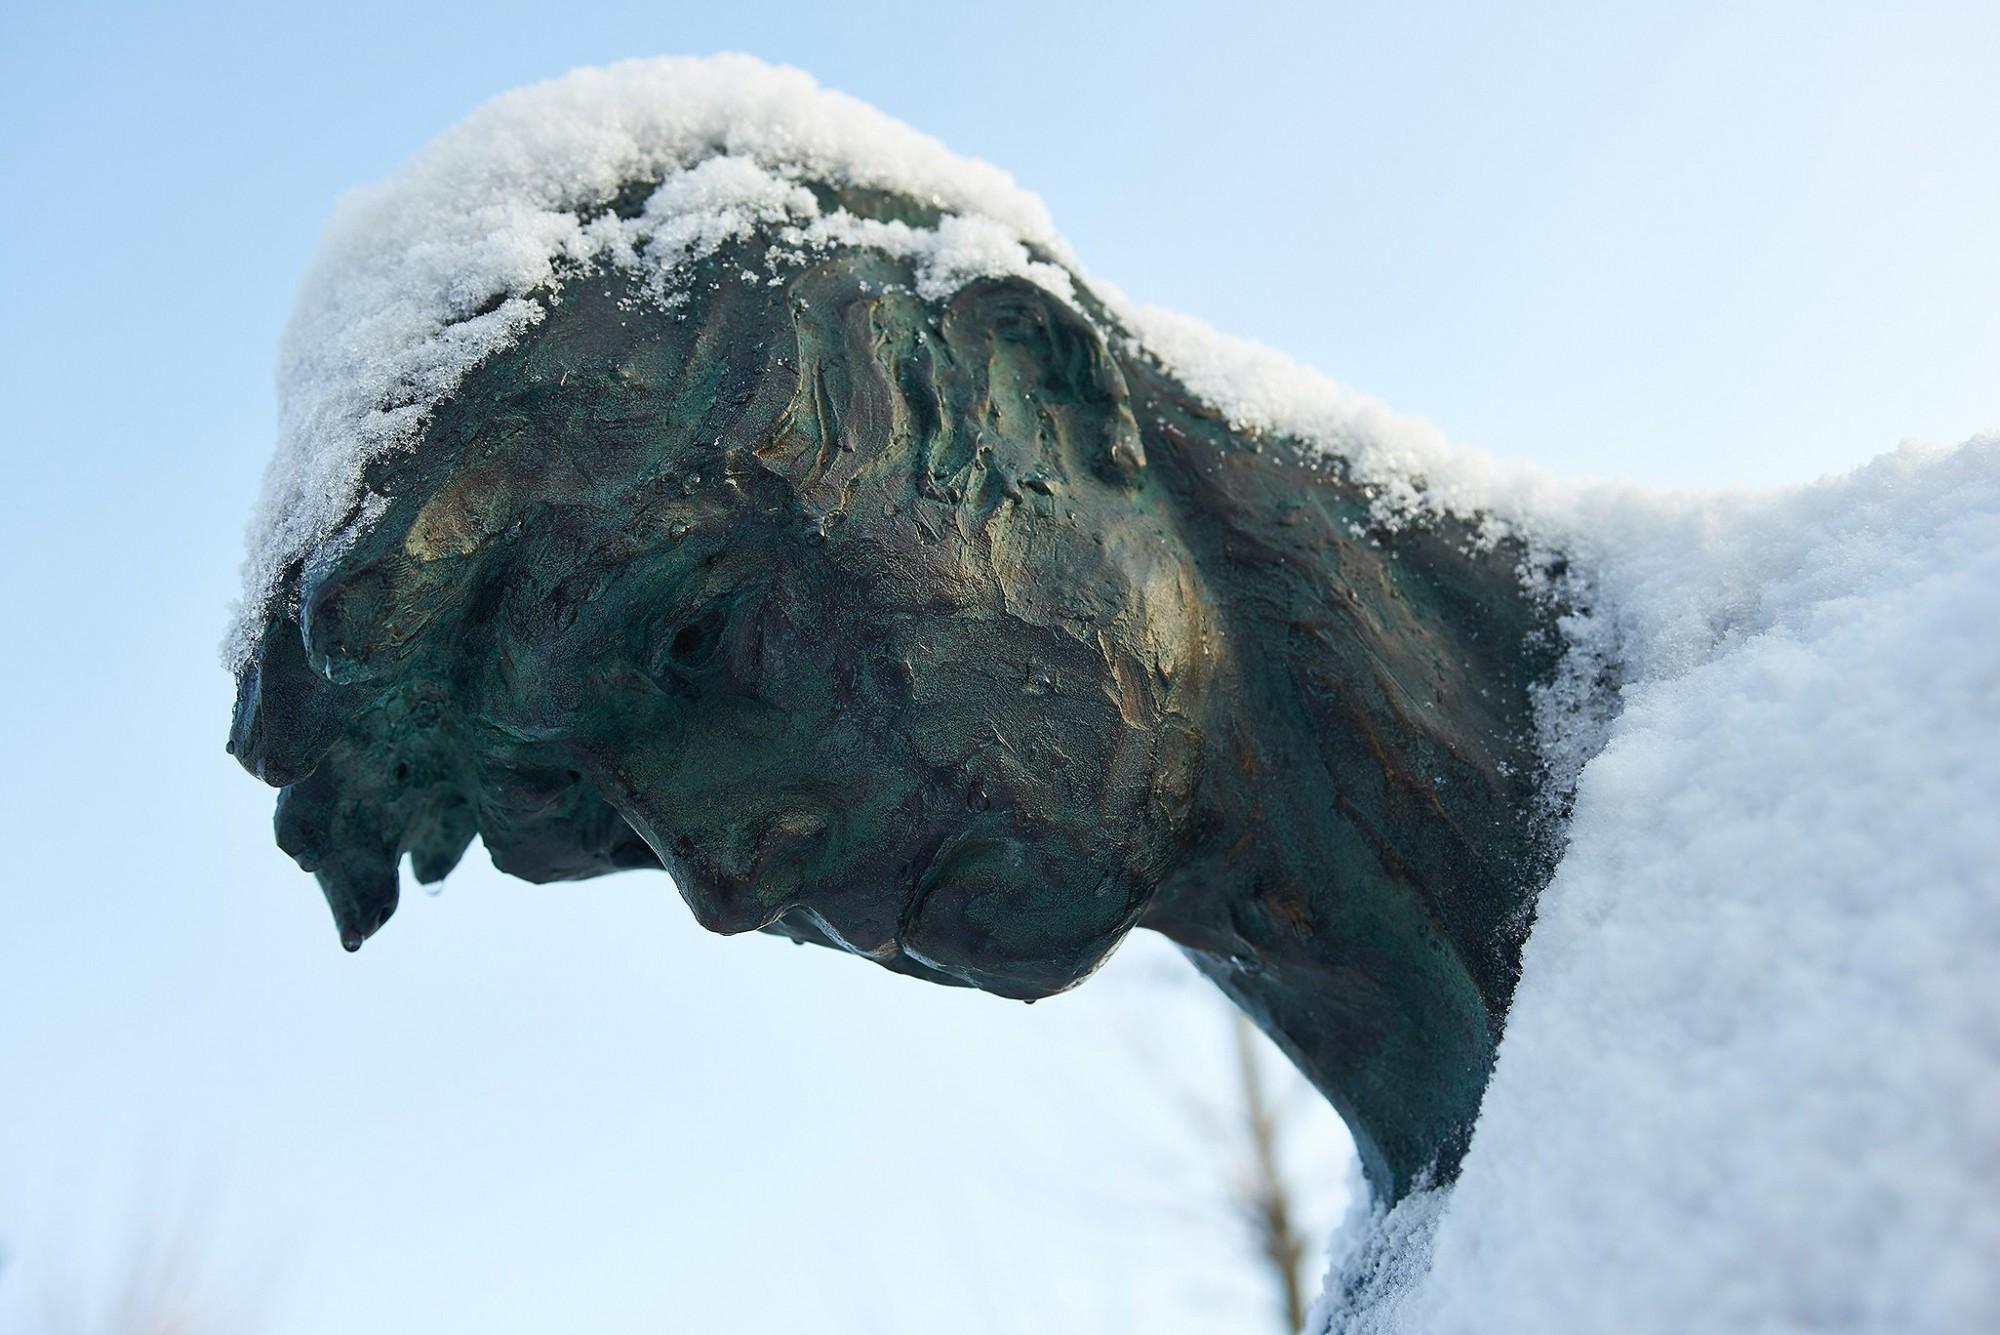 Afbeelding: Sculptuur brons - detail